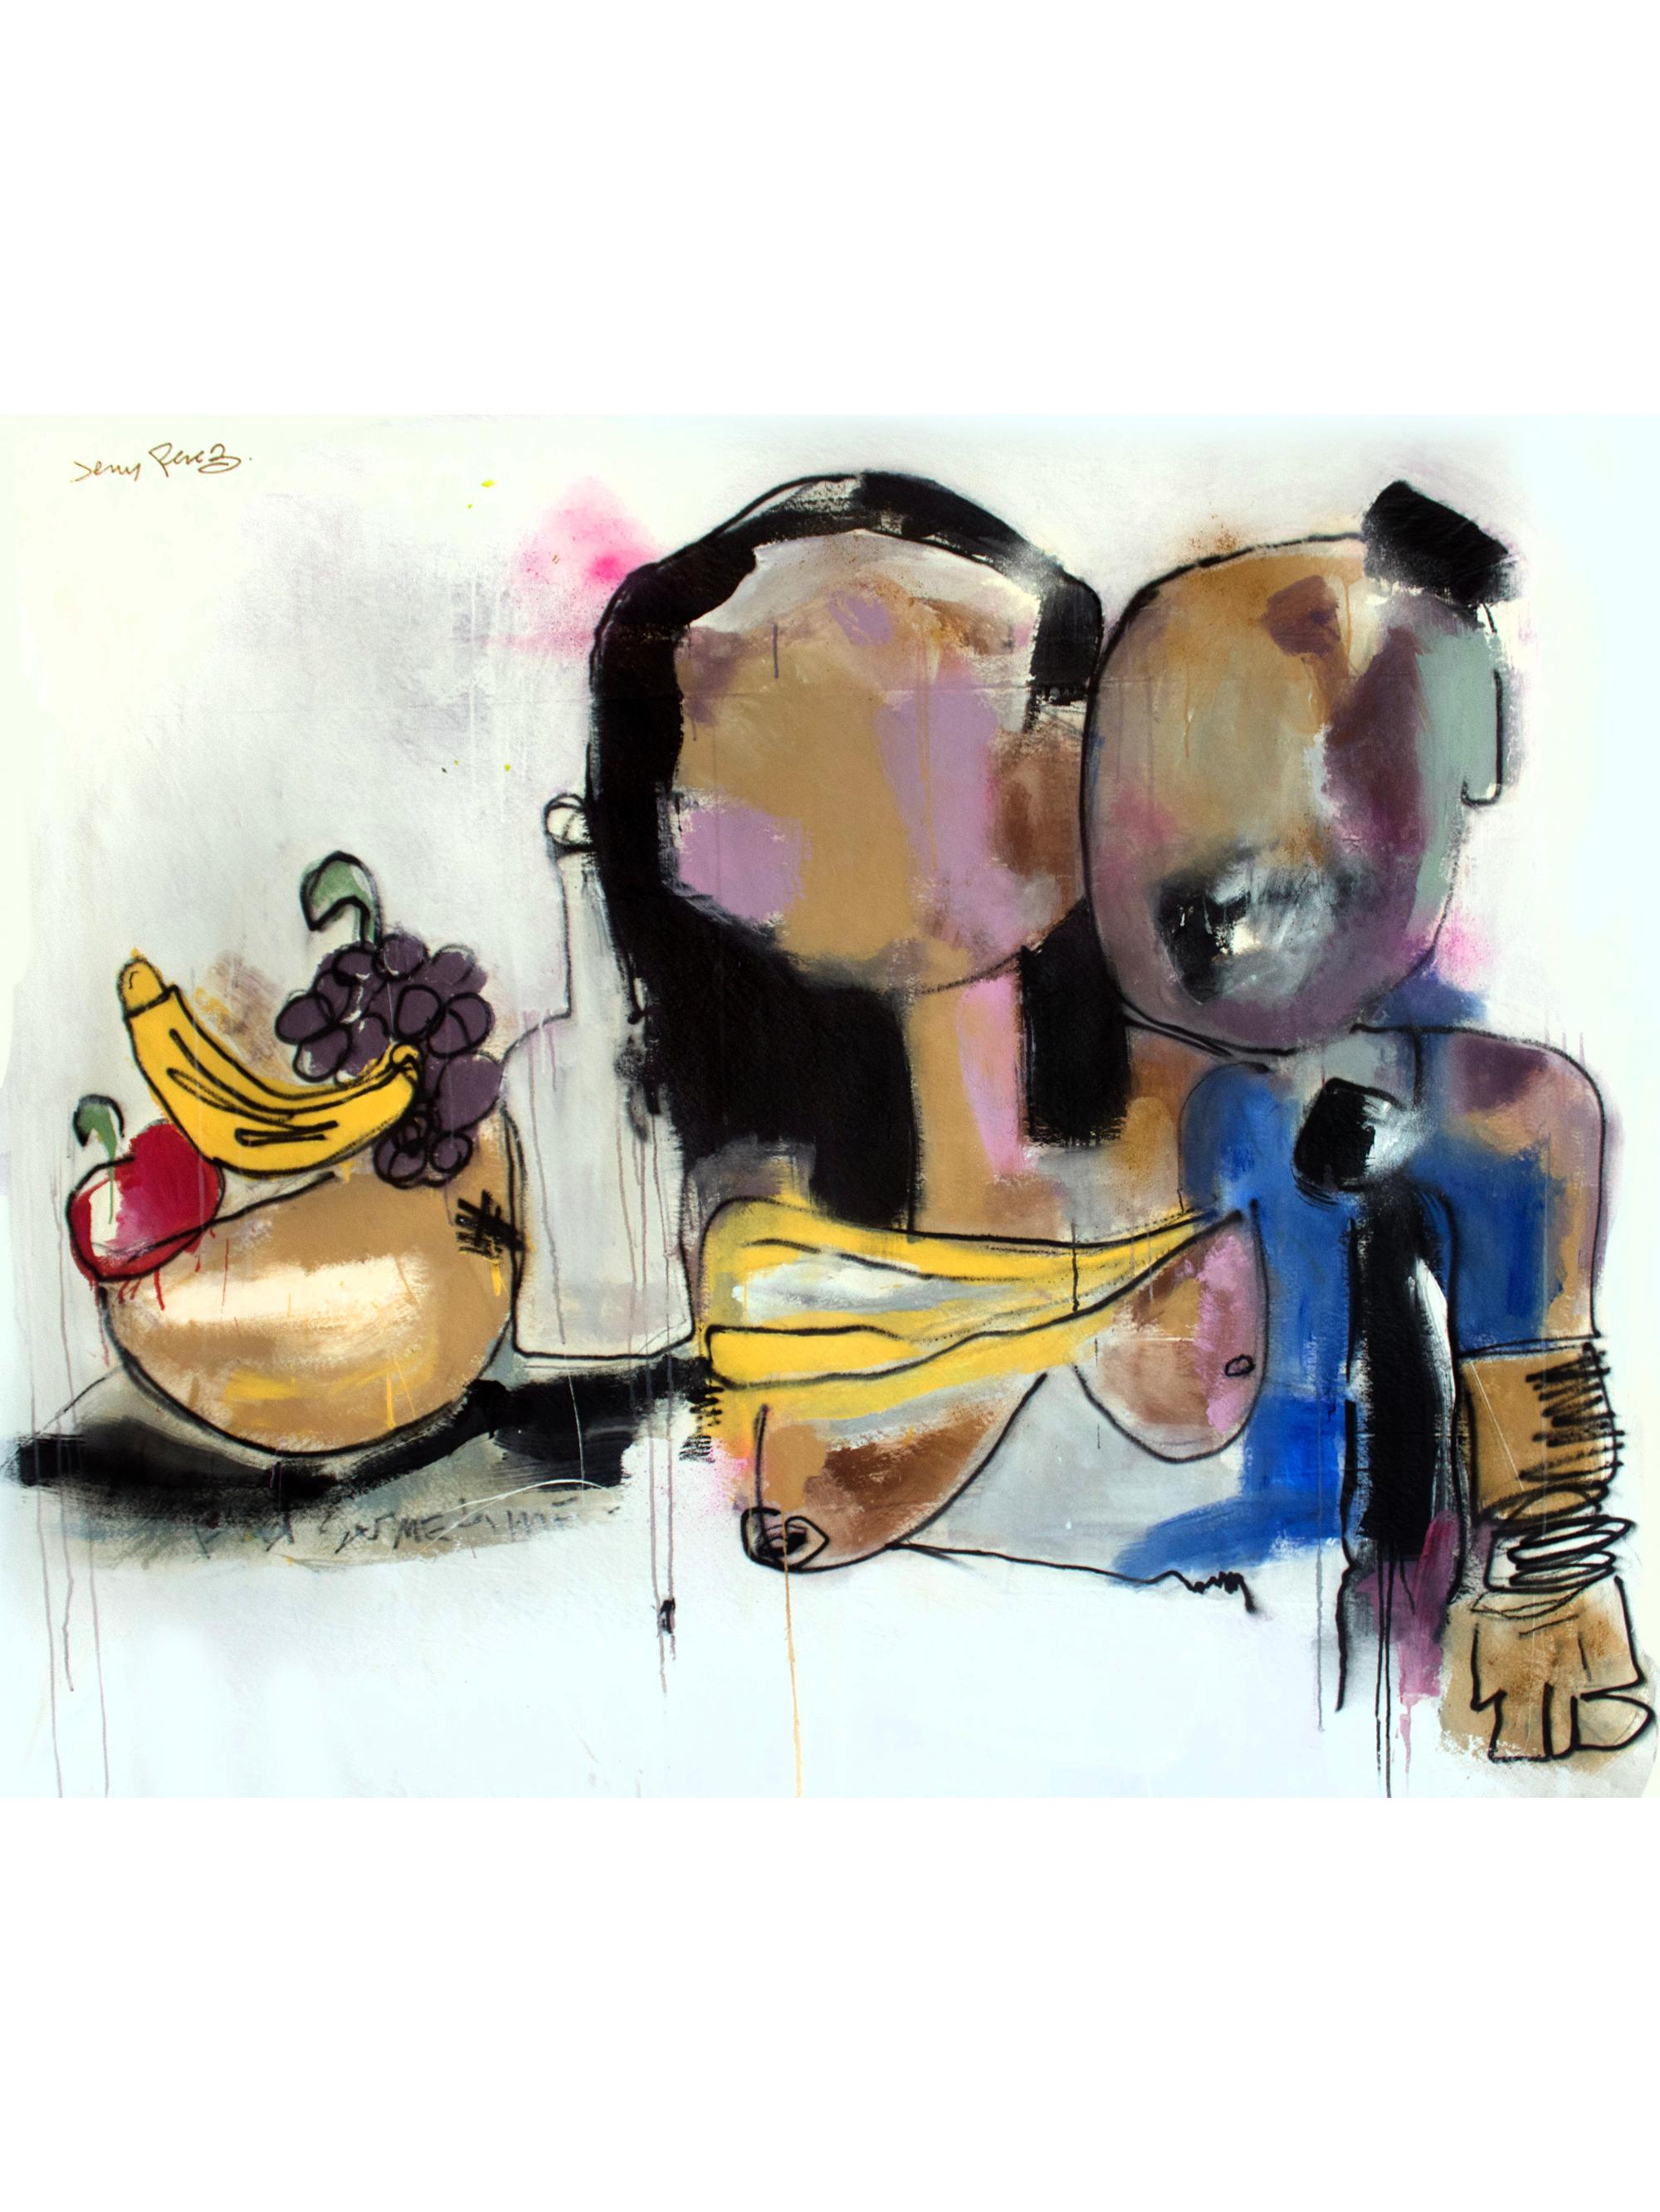 "Find Sometime - 58 x 70"" - Acrylic, aerosol, oil stick on canvas, 2019"